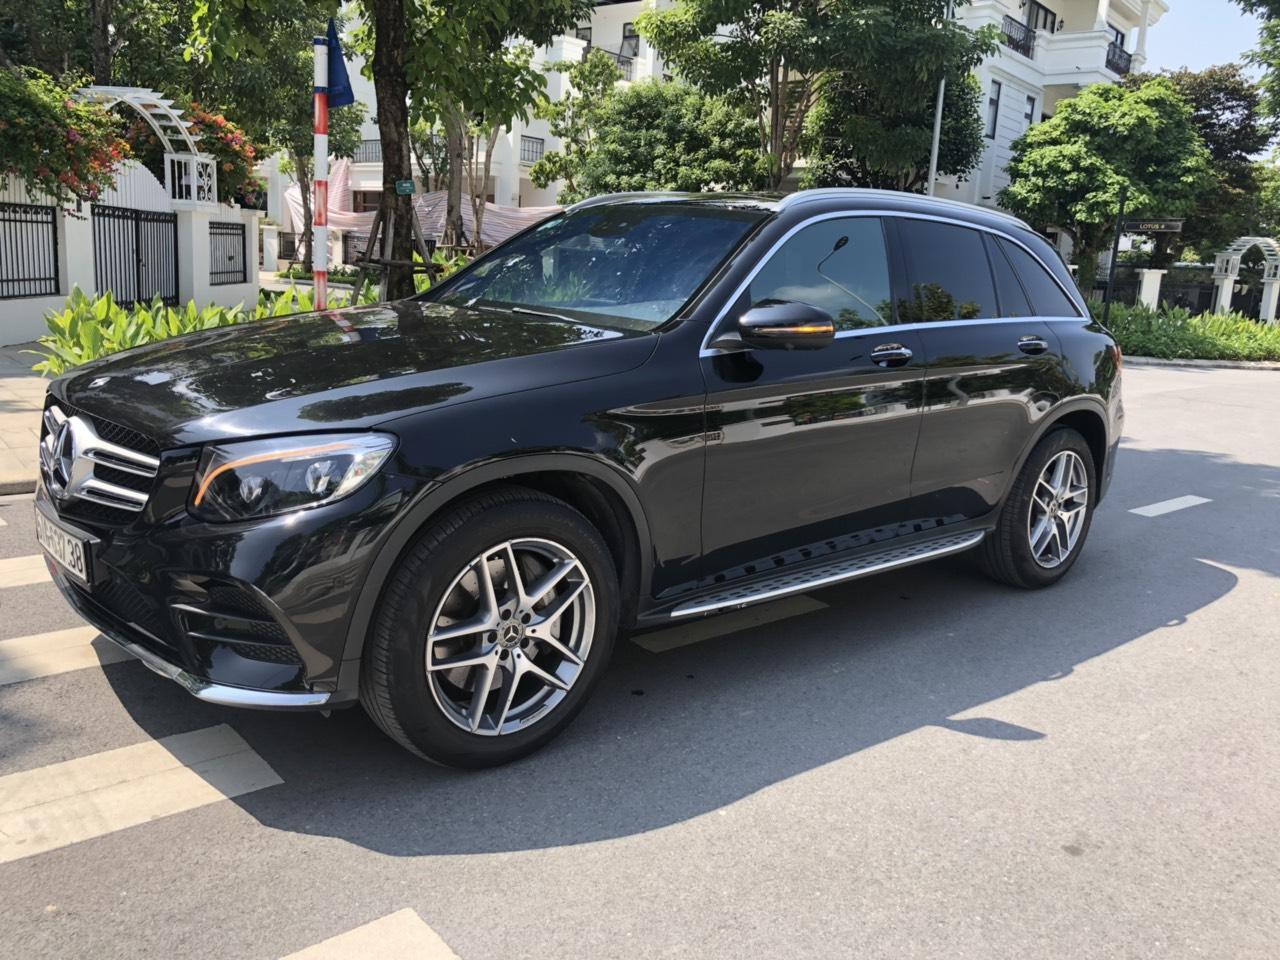 Mercedes Benz GLC300 2018